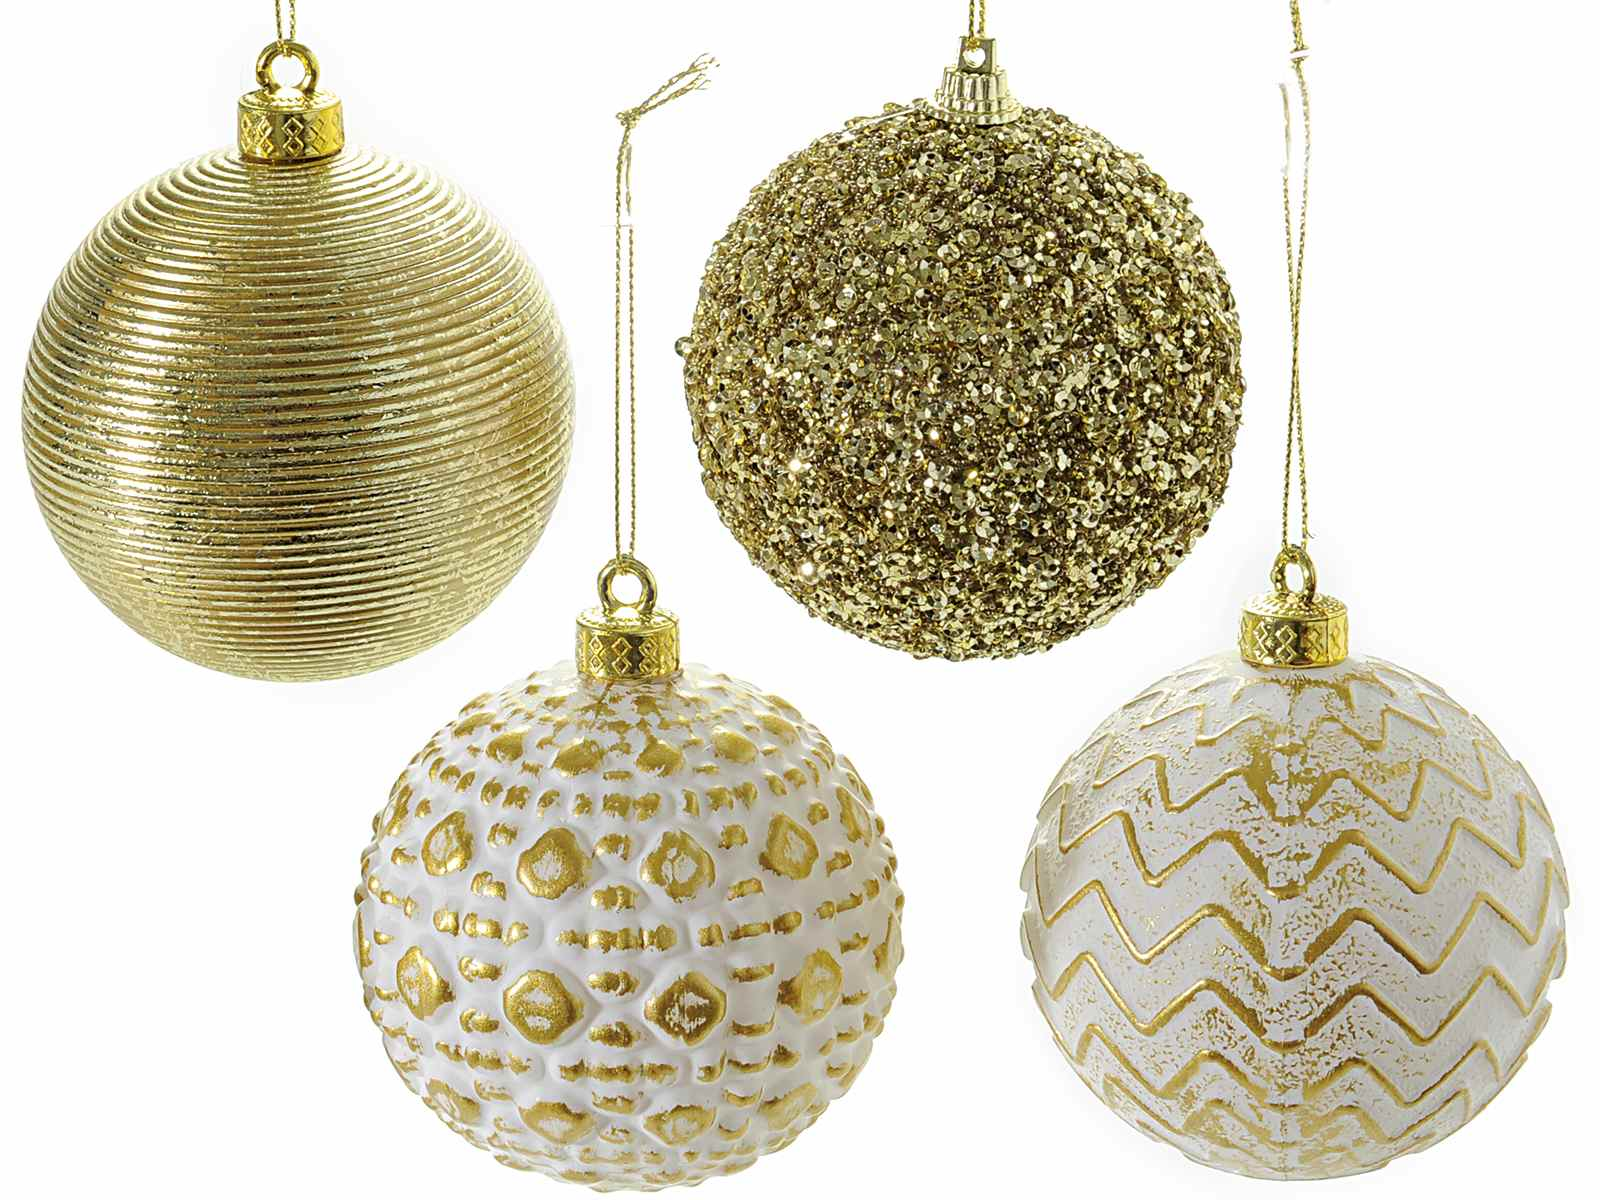 Goldene Weihnachtskugeln.Hängende Goldene Weihnachtskugeln 59 01 12 Art From Italy